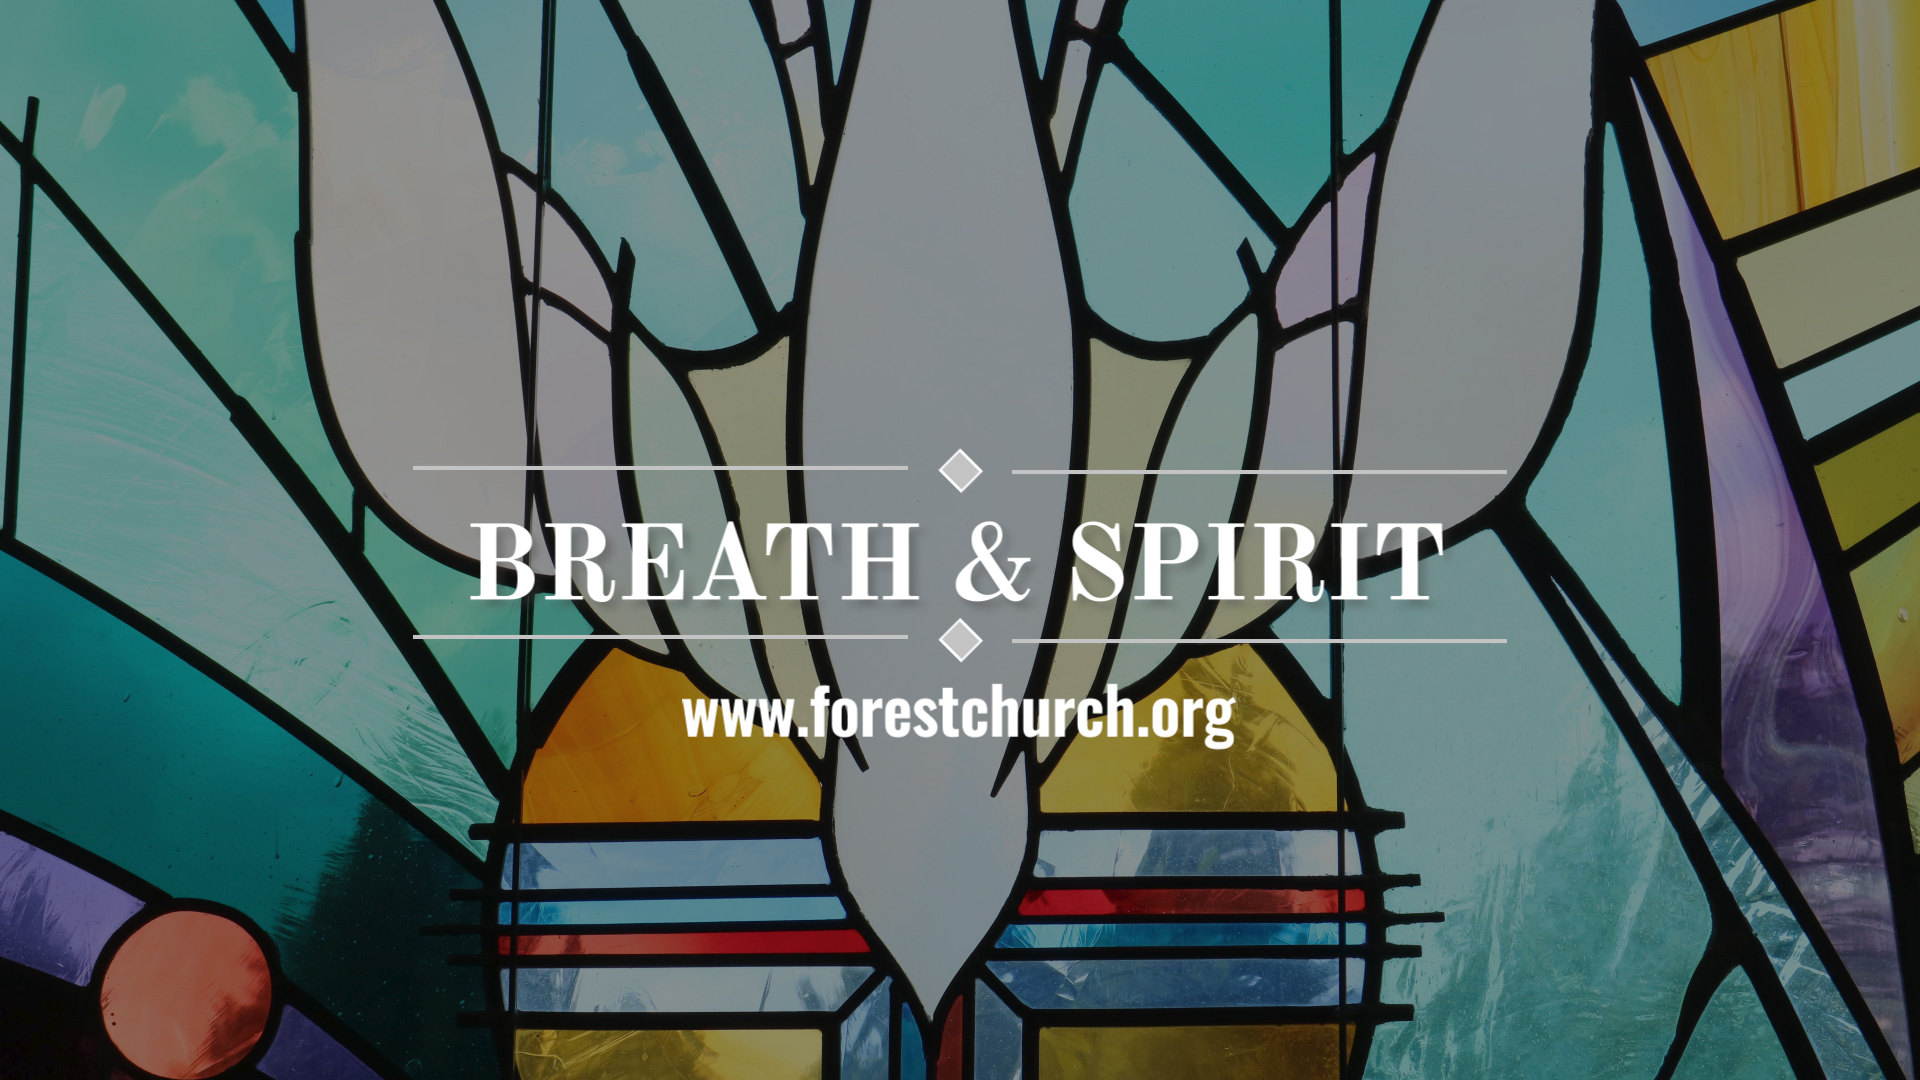 Breath and Spirit